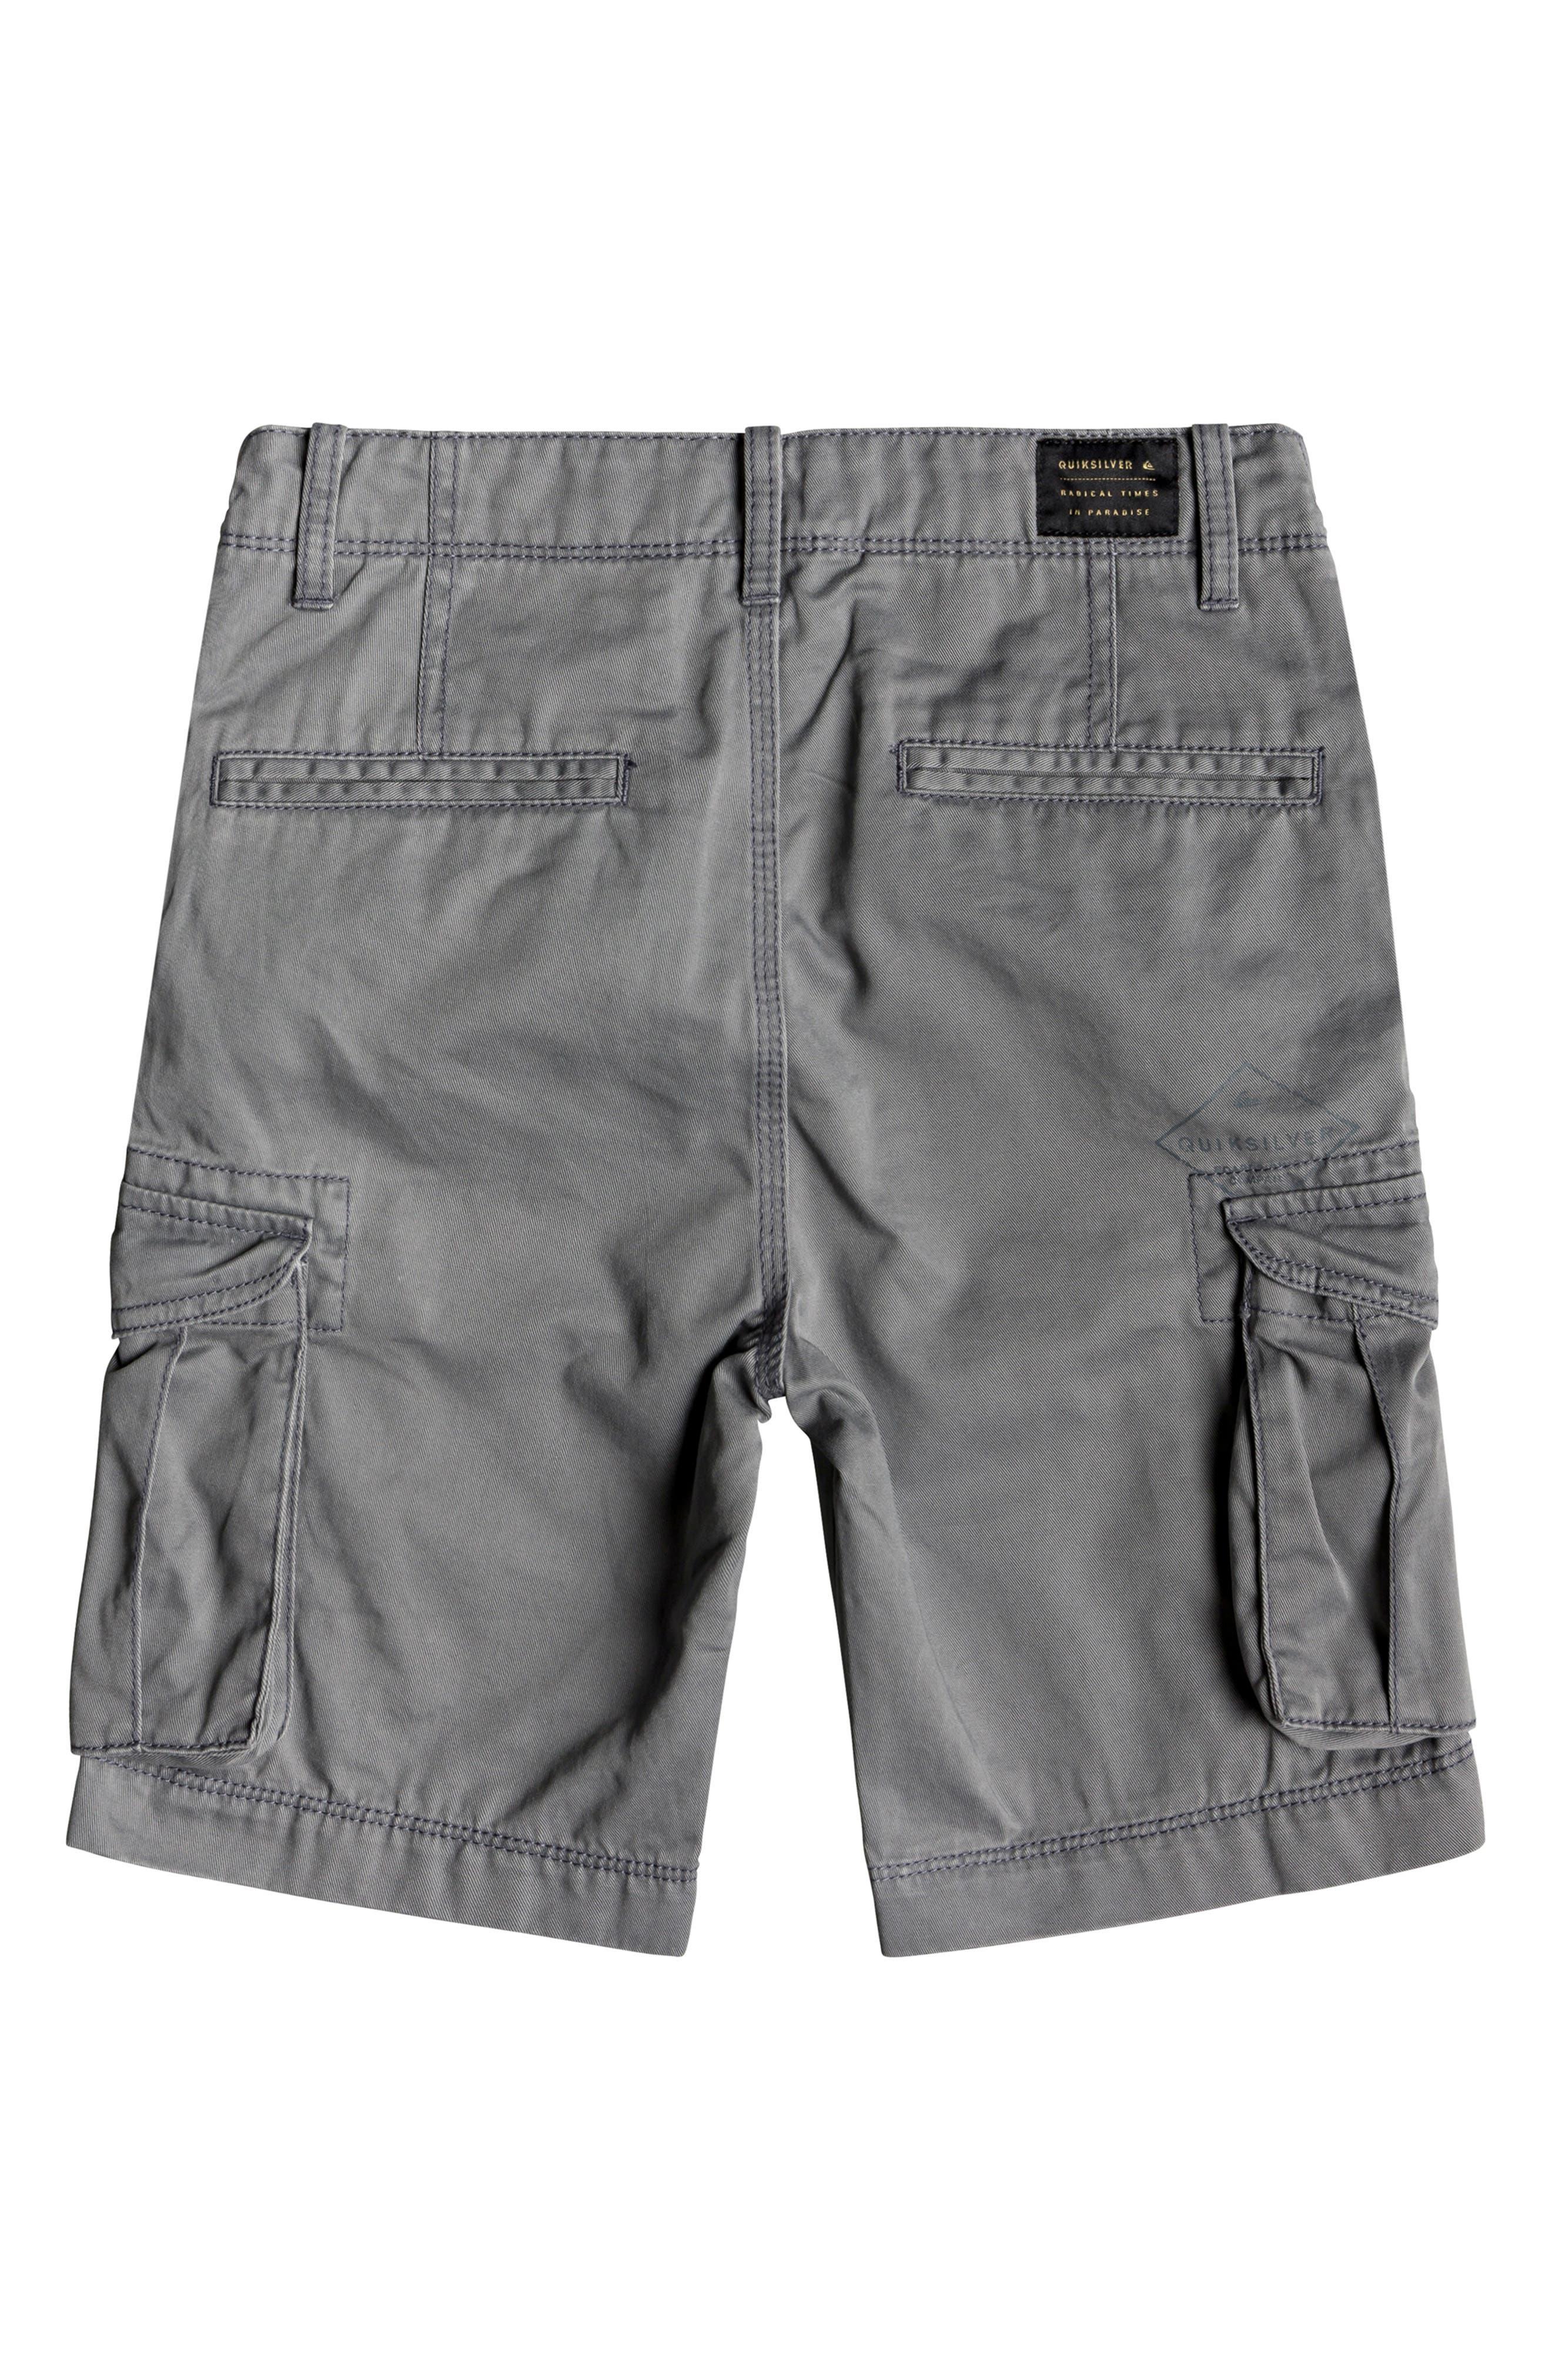 Crucial Battle Cargo Shorts,                             Alternate thumbnail 2, color,                             QUIET SHADE